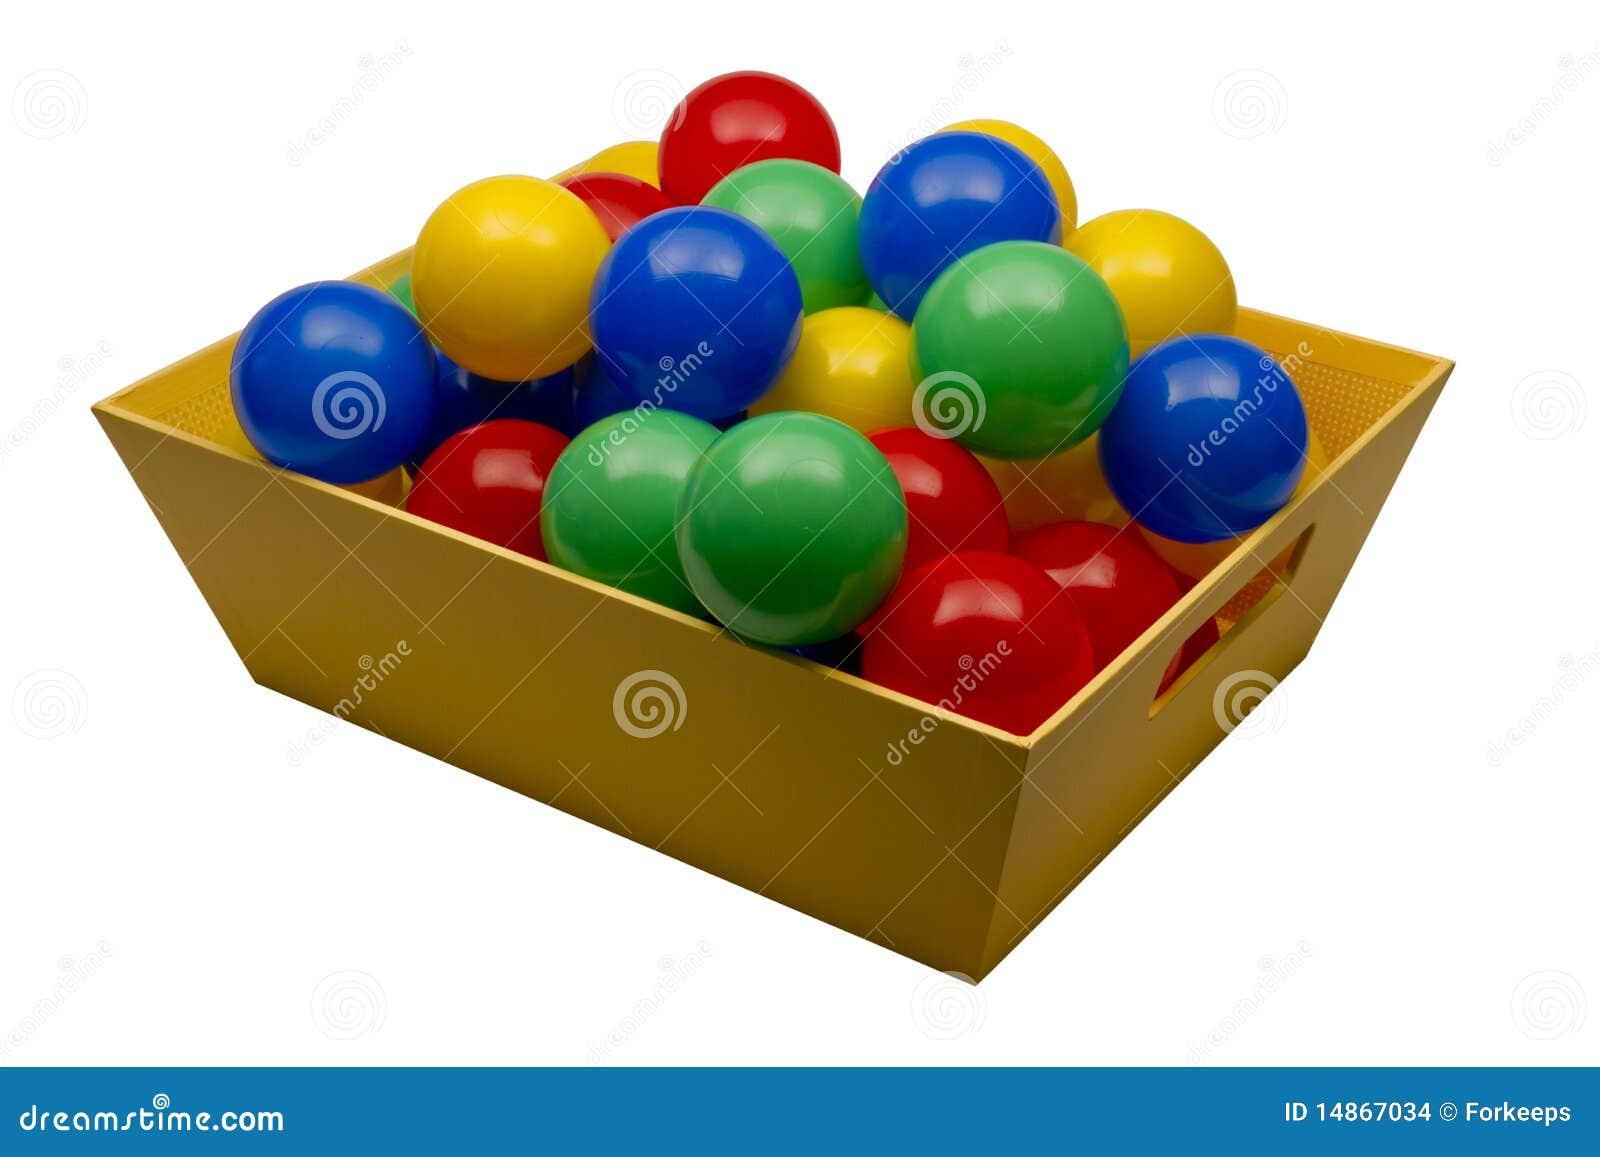 Plastic Toy Balls : Plastic toy balls stock images image